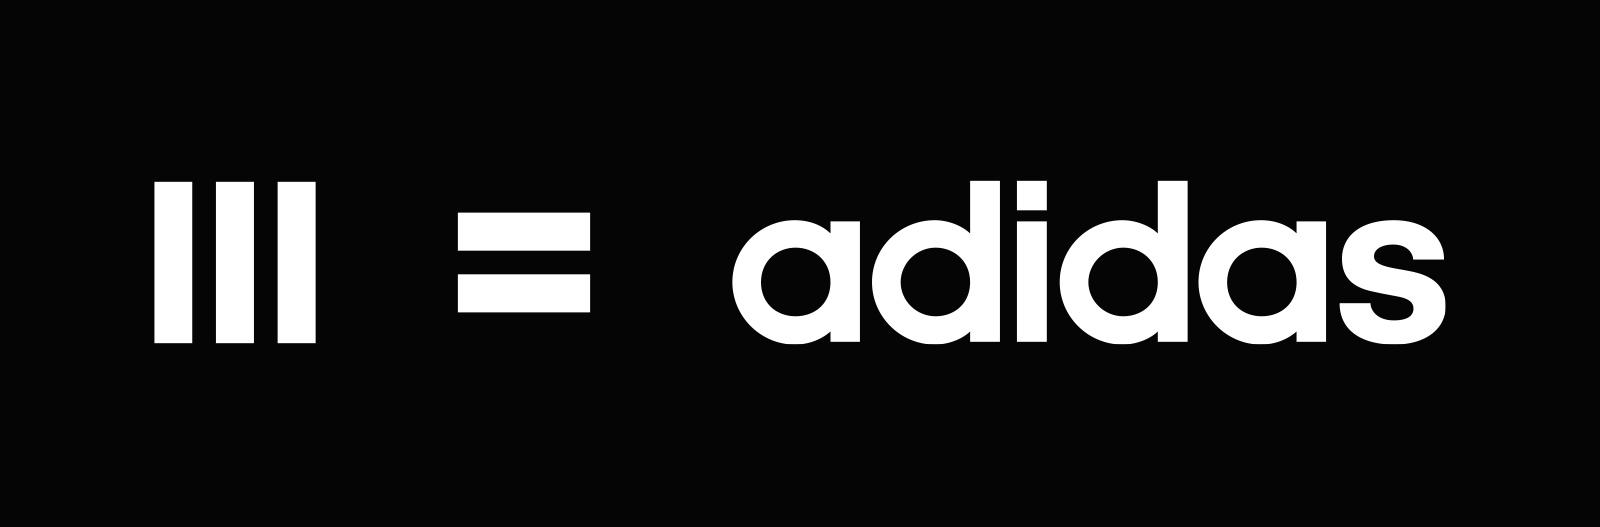 bbf378b74985 Adidas Brand Design Study on Behance